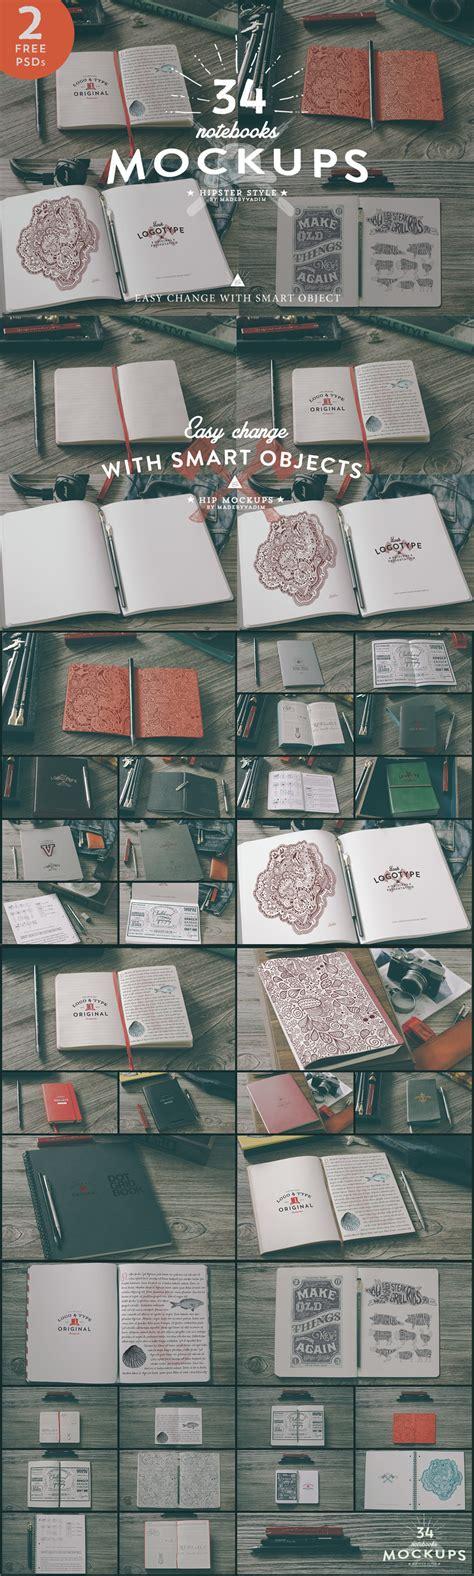 Creativemarket The Ultimate Mockup Bundle the ultimate mockup templates bundle design cuts design cuts